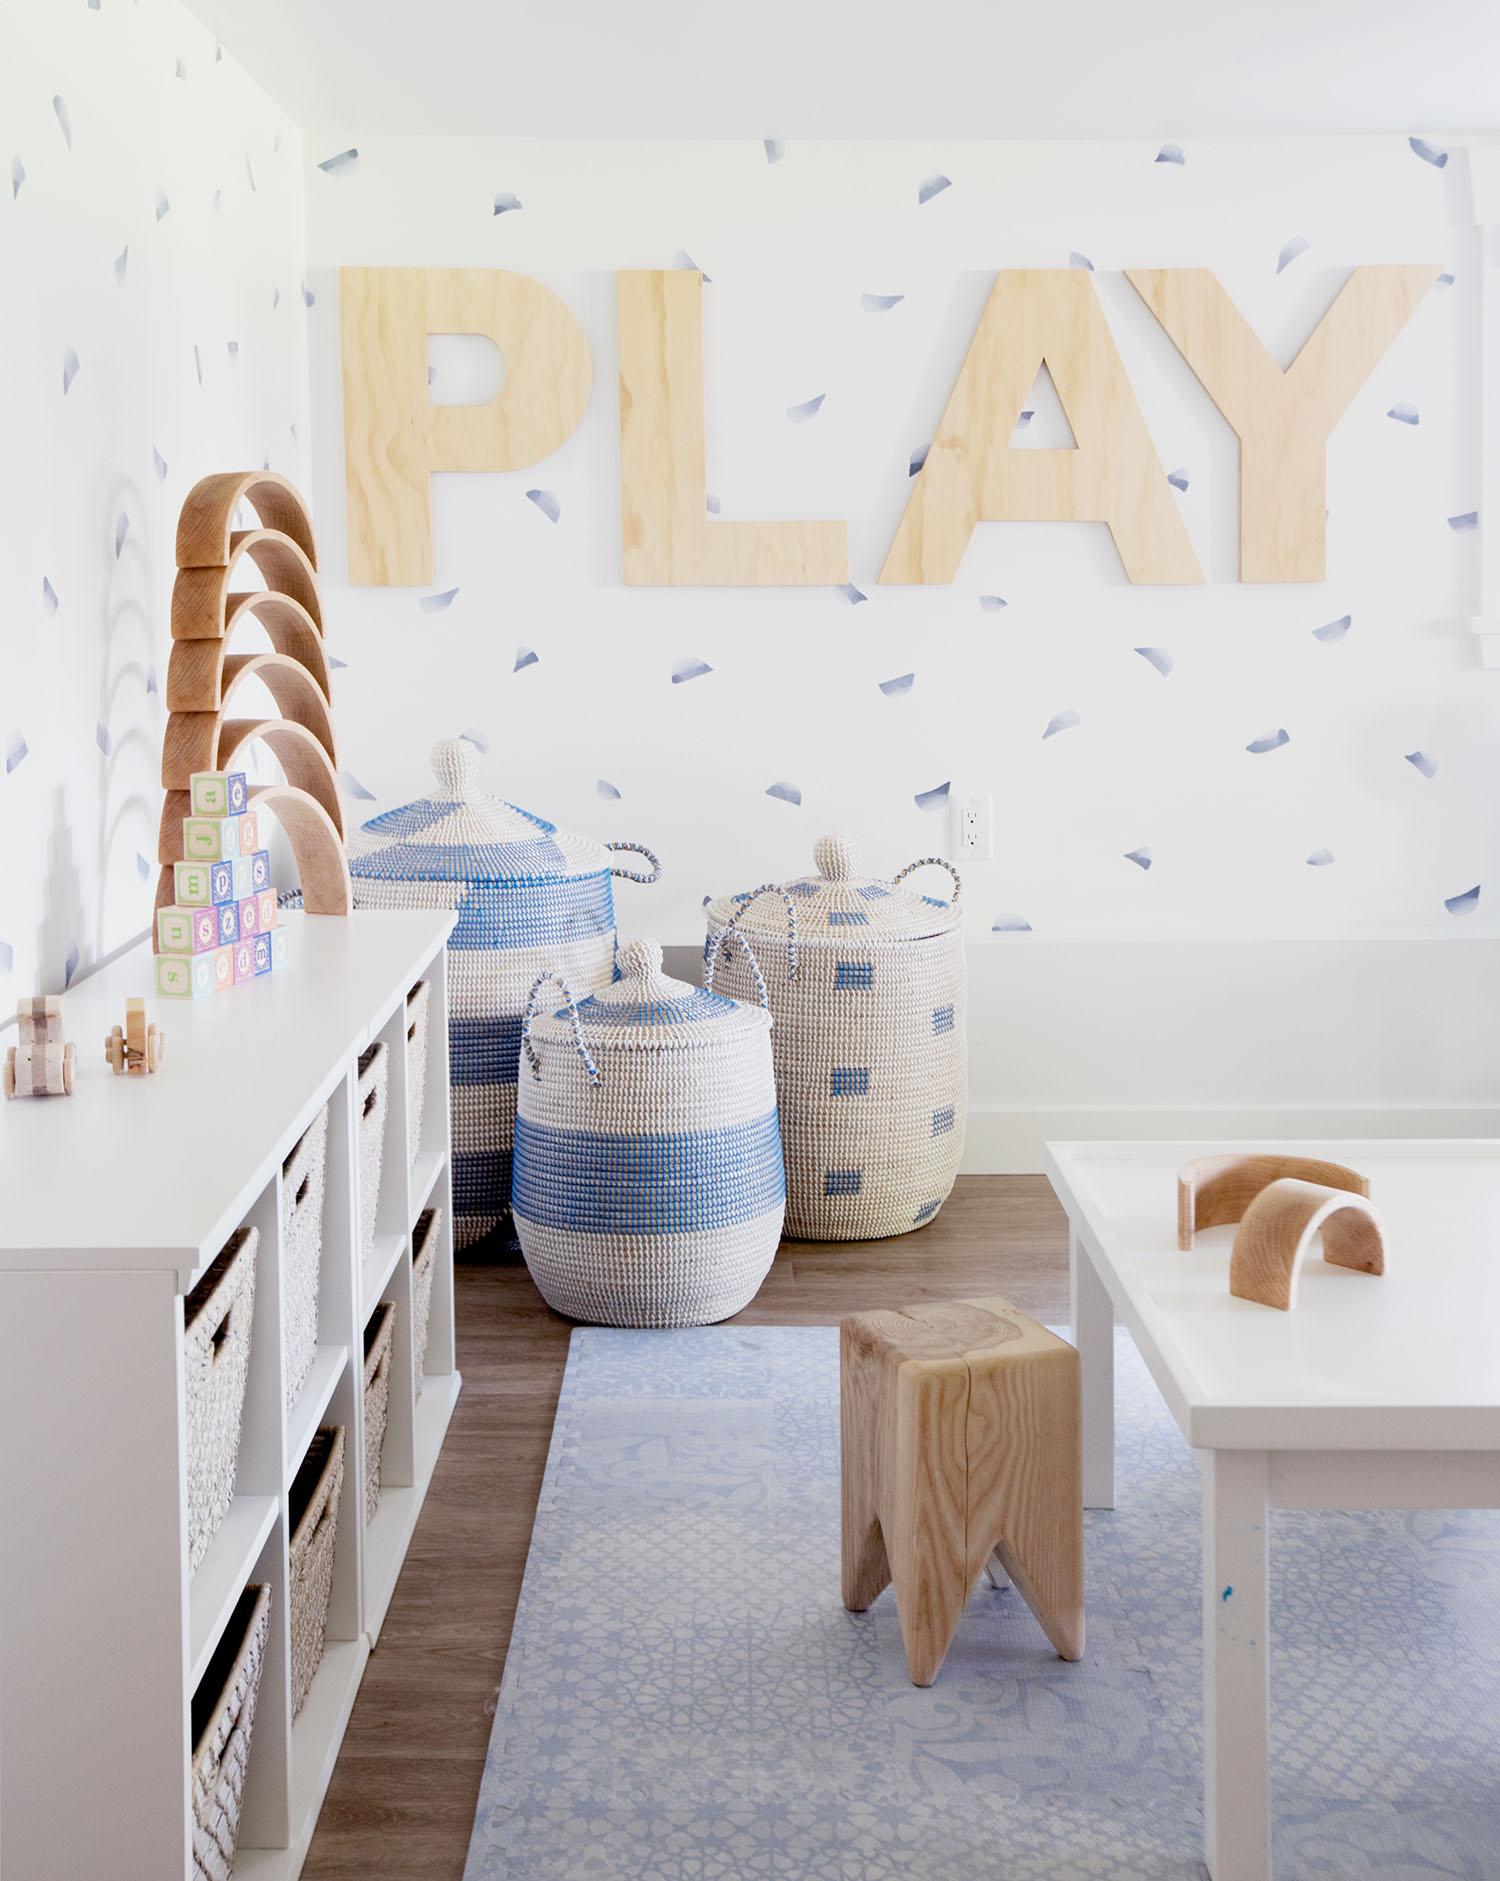 Baker_playroom letters.jpg